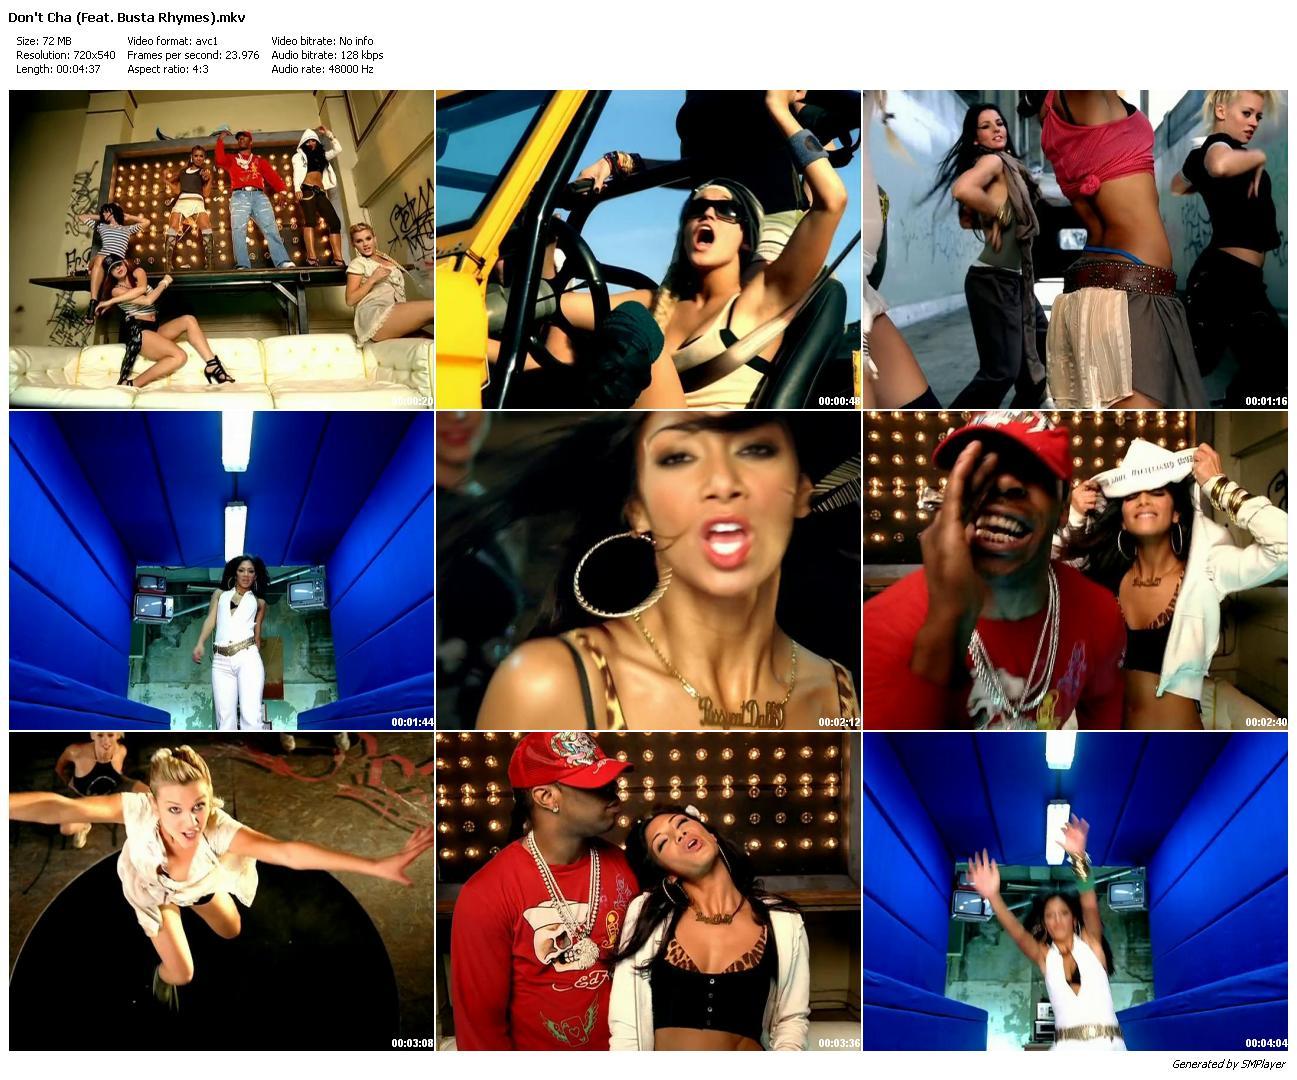 http://3.bp.blogspot.com/-CcaN4LOSO5E/T6v7KPuvupI/AAAAAAAAE3Q/tKtDCxEfDOE/s1600/Don\'t+Cha+(Feat.+Busta+Rhymes)_preview.jpg